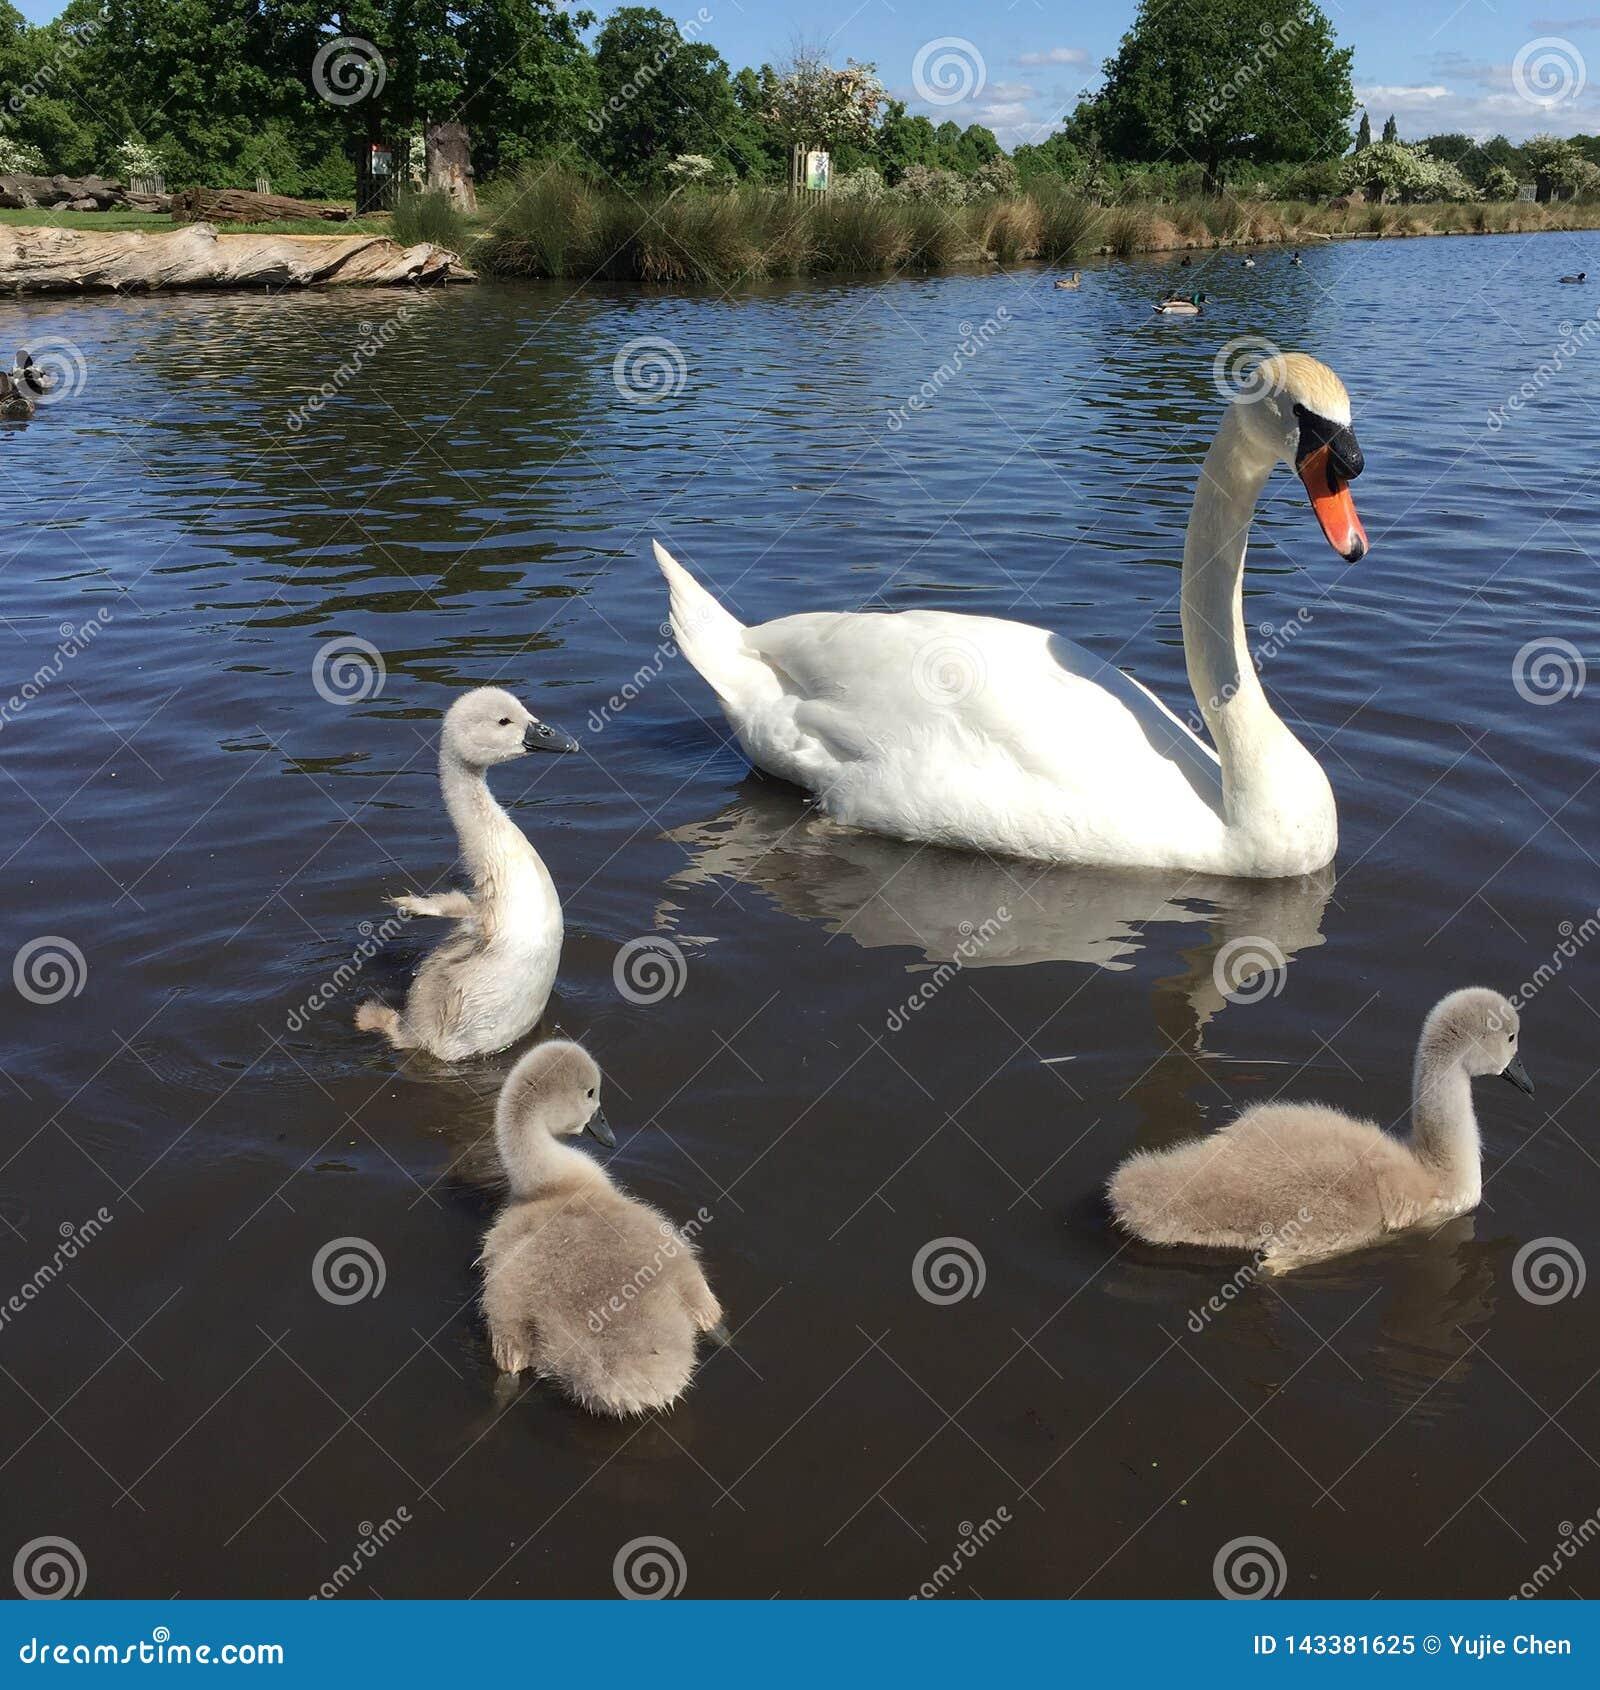 A swan and three cygnets